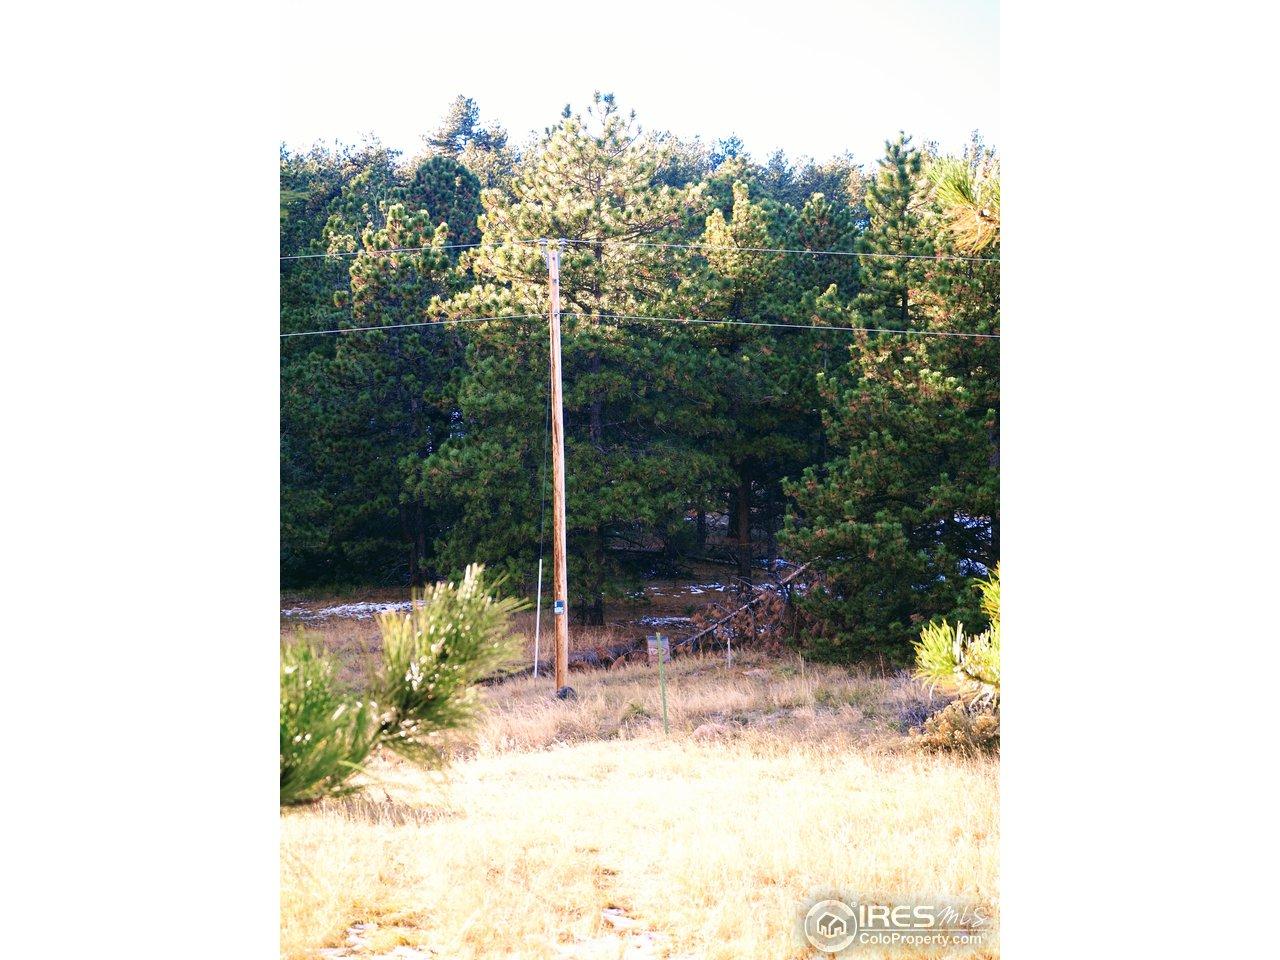 Electric pole on Property